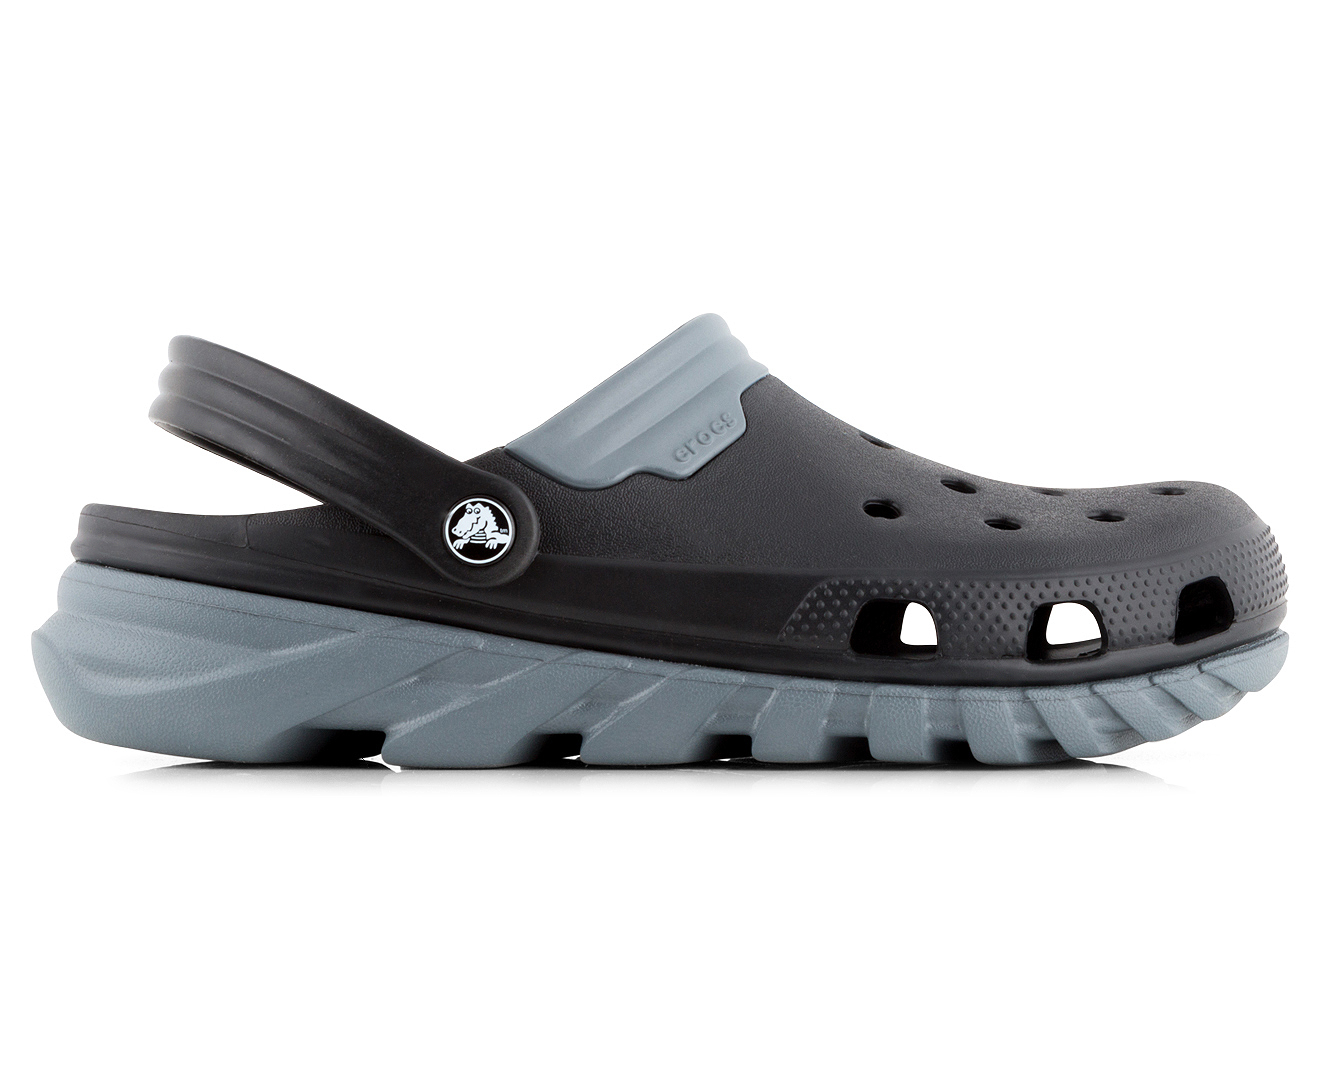 Crocs Duet Black Roomy Fit Clog Shoes